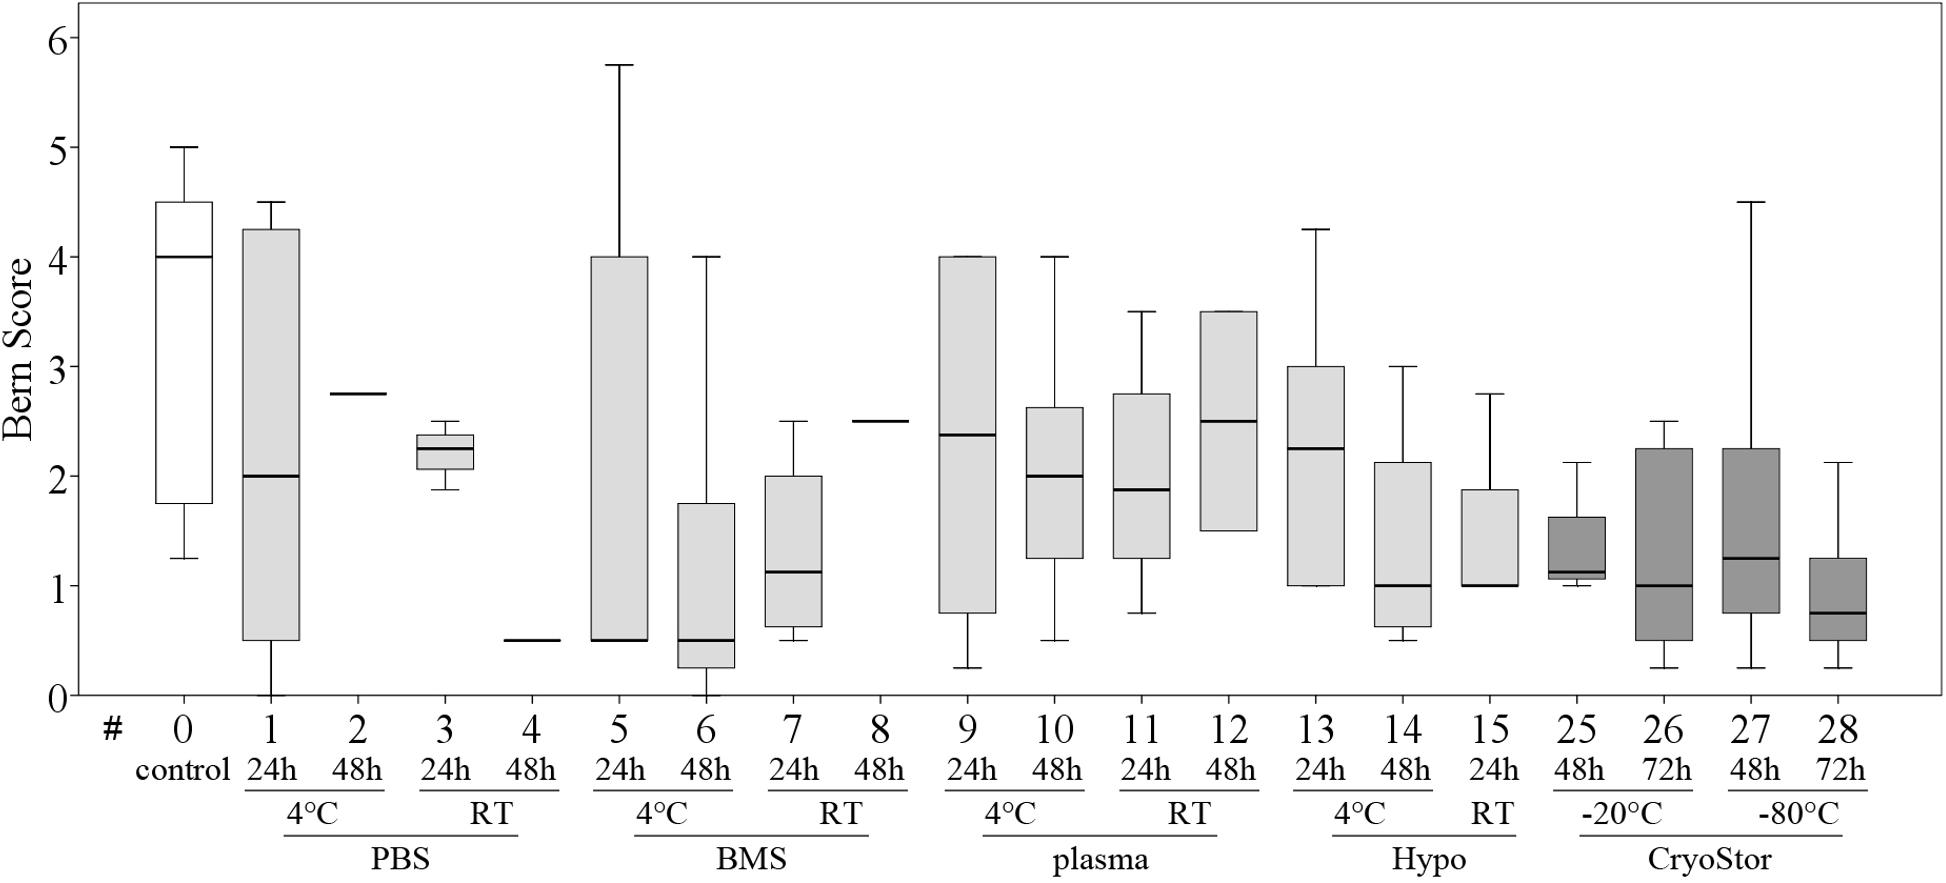 Evaluation of transport conditions for autologous bone marrow